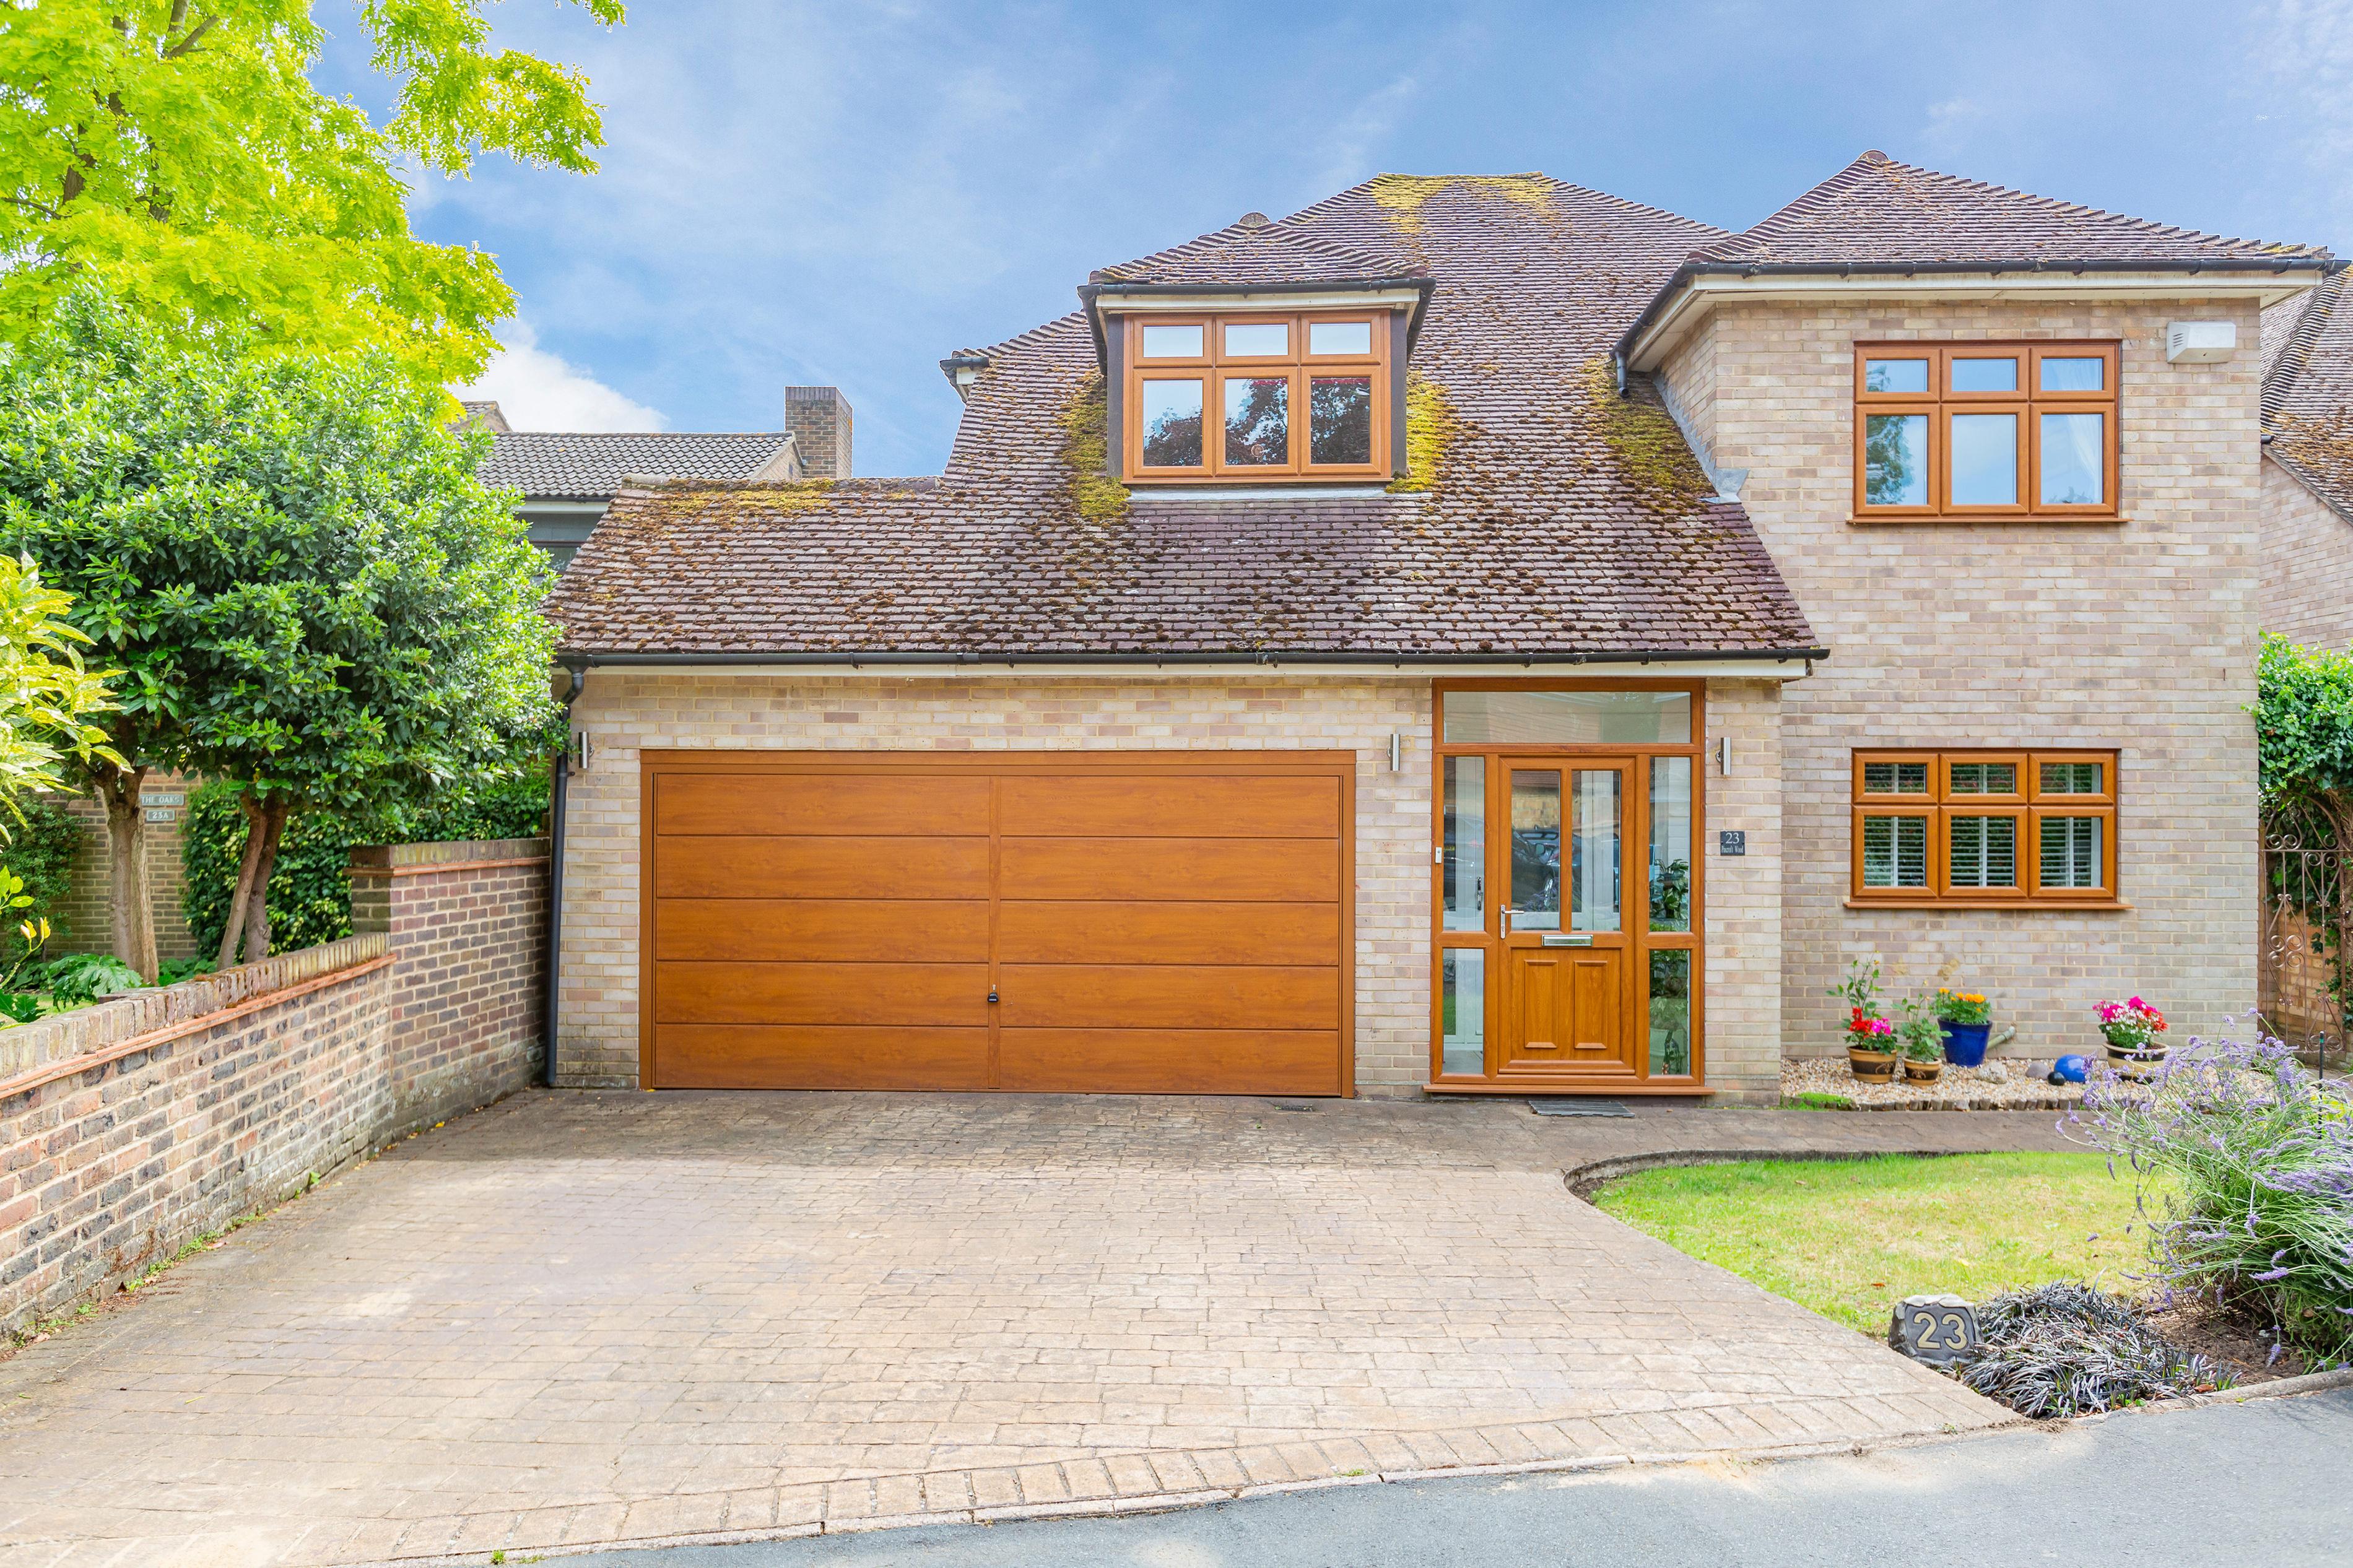 New Barn - £745,000